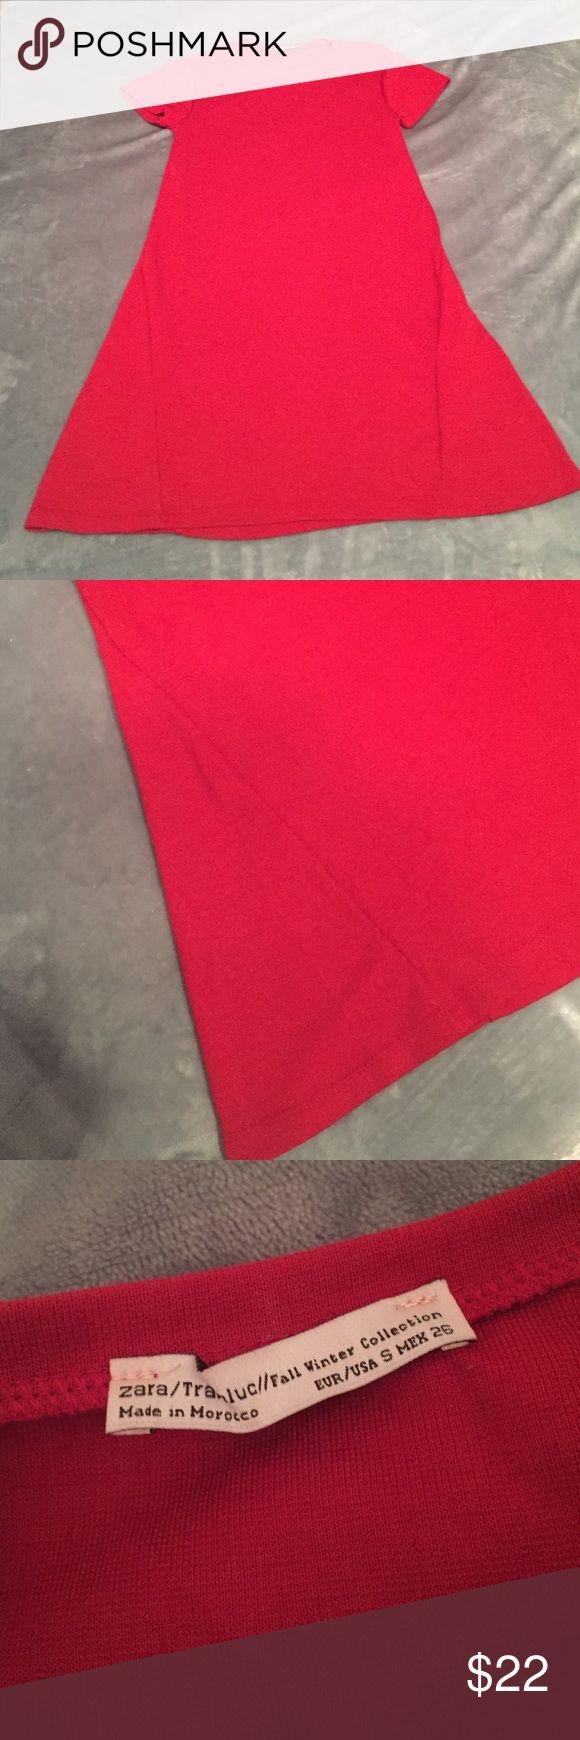 Red Zara tshirt dress Worn once Zara Dresses Mini